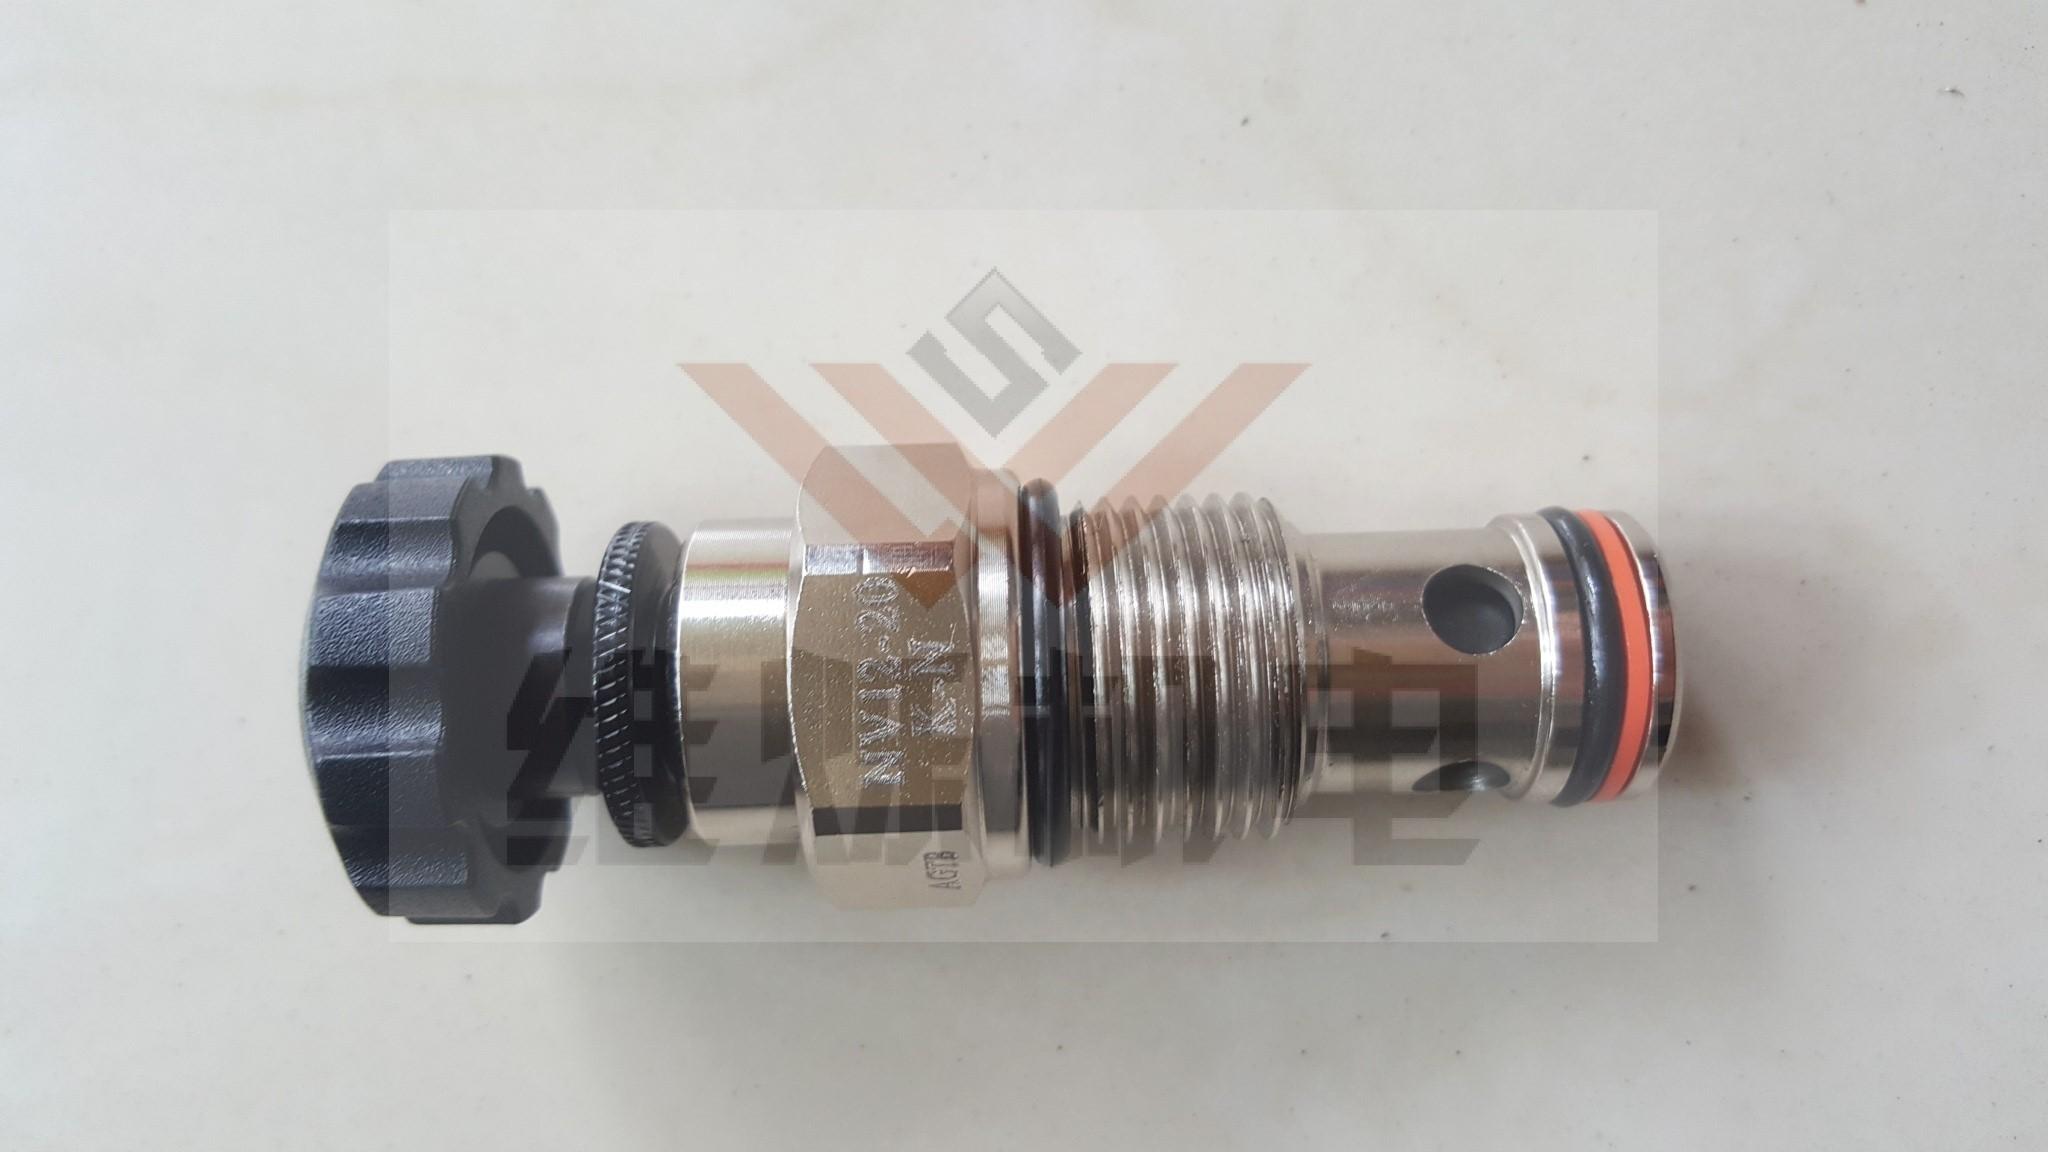 NV12-20-K-N节流阀(针阀) – 重庆维烁矿山机电设备有限公司